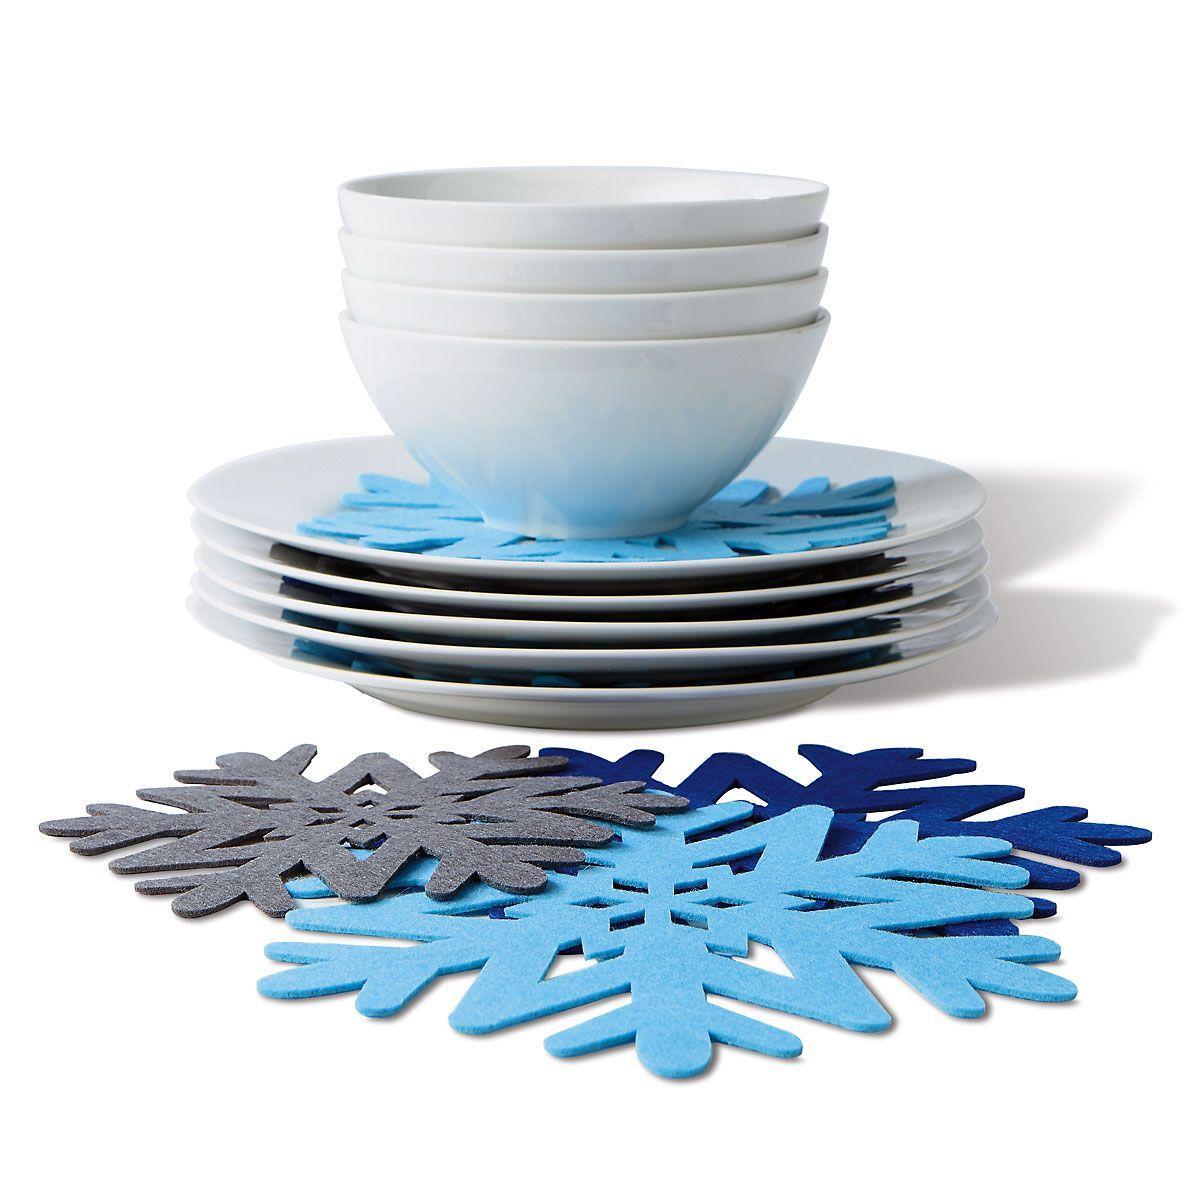 Snowflake Plate Protectors